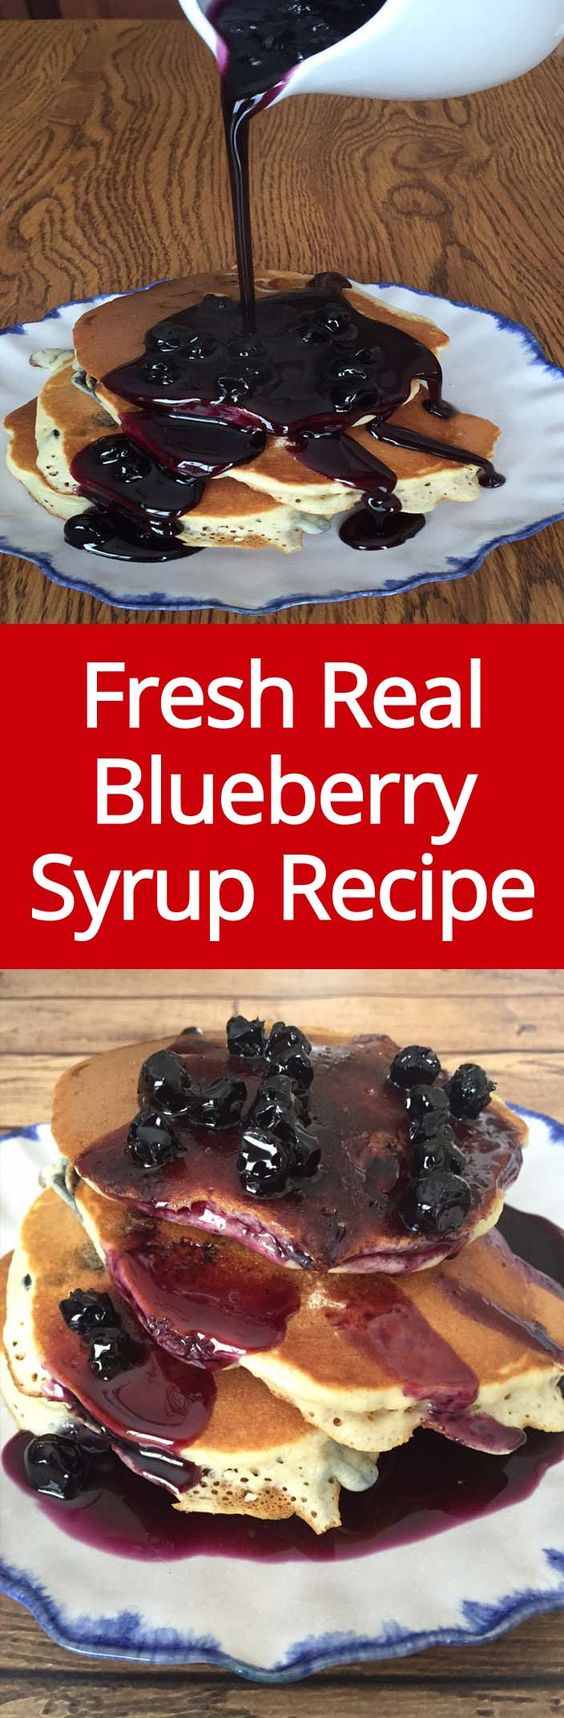 Homemade Blueberry Syrup Recipe - easy to make, amazing on pancakes and ice cream! | MelanieCooks.com